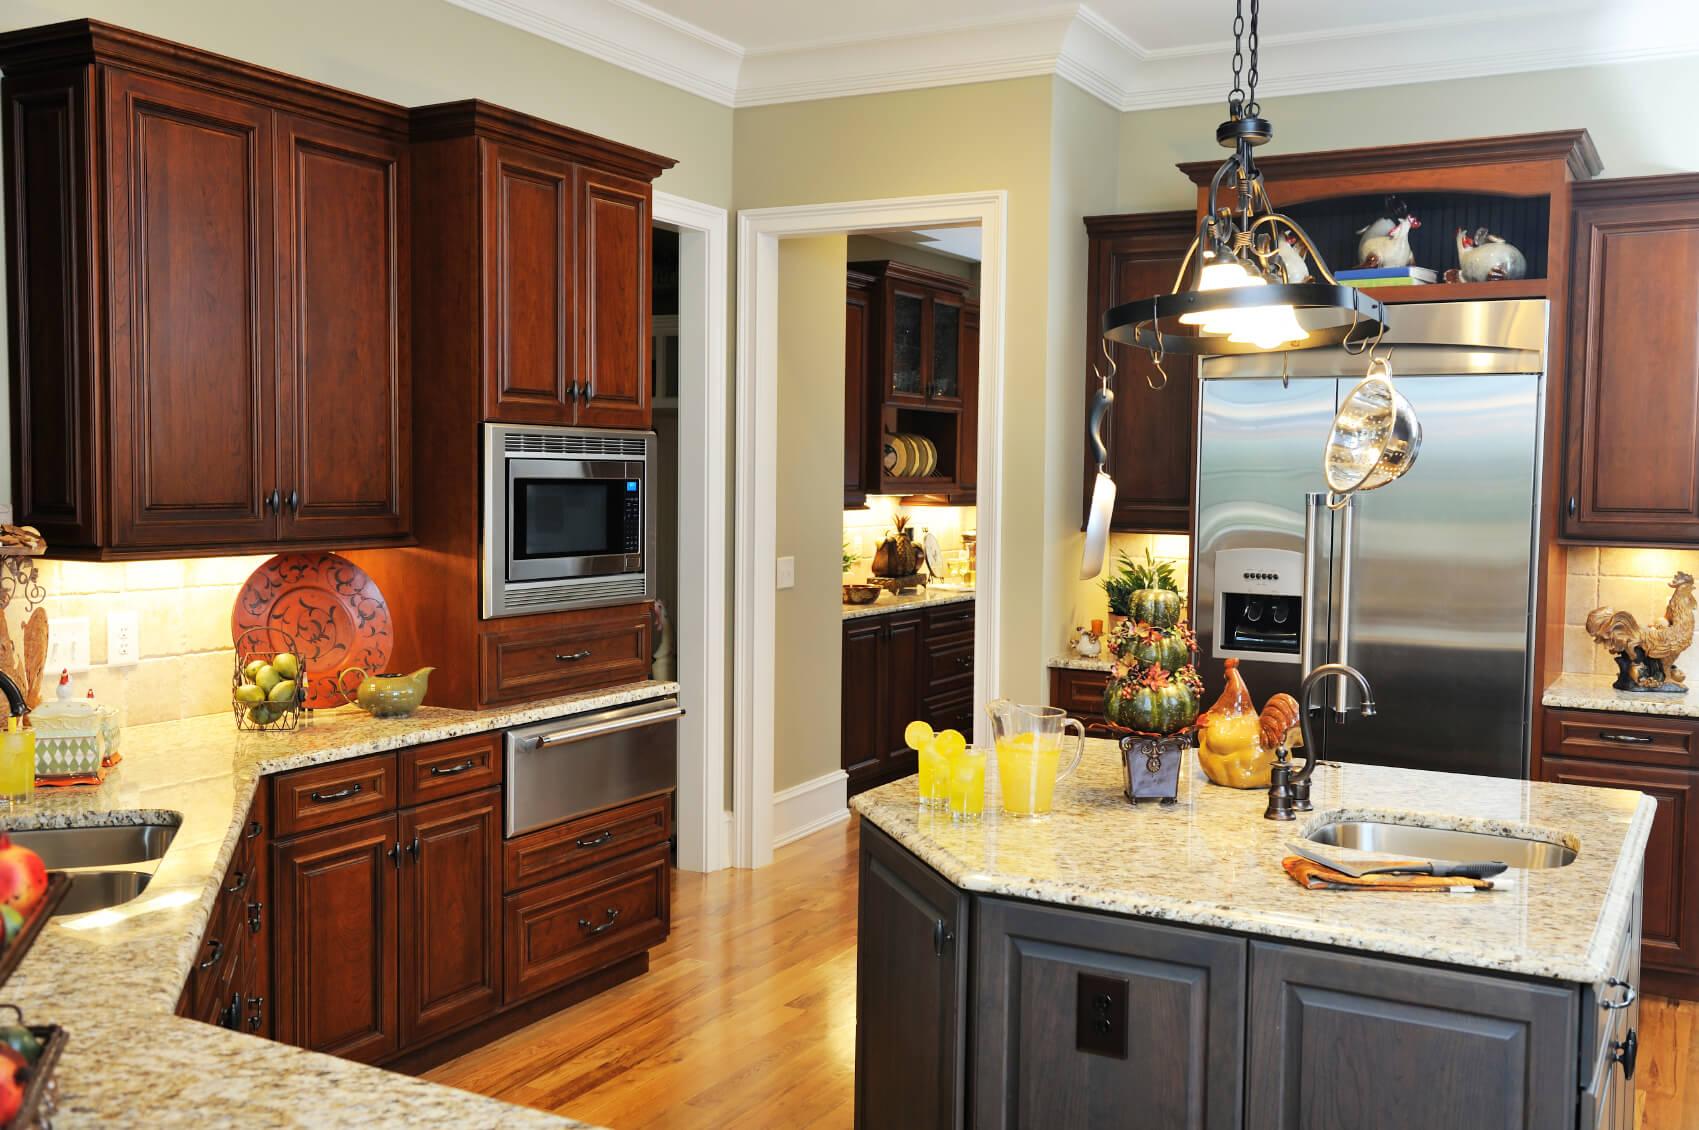 52 Dark Kitchens with Dark Wood and Black Kitchen Cabinets on Maple Kitchen Cabinets With Dark Wood Floors Dark Countertops  id=92142